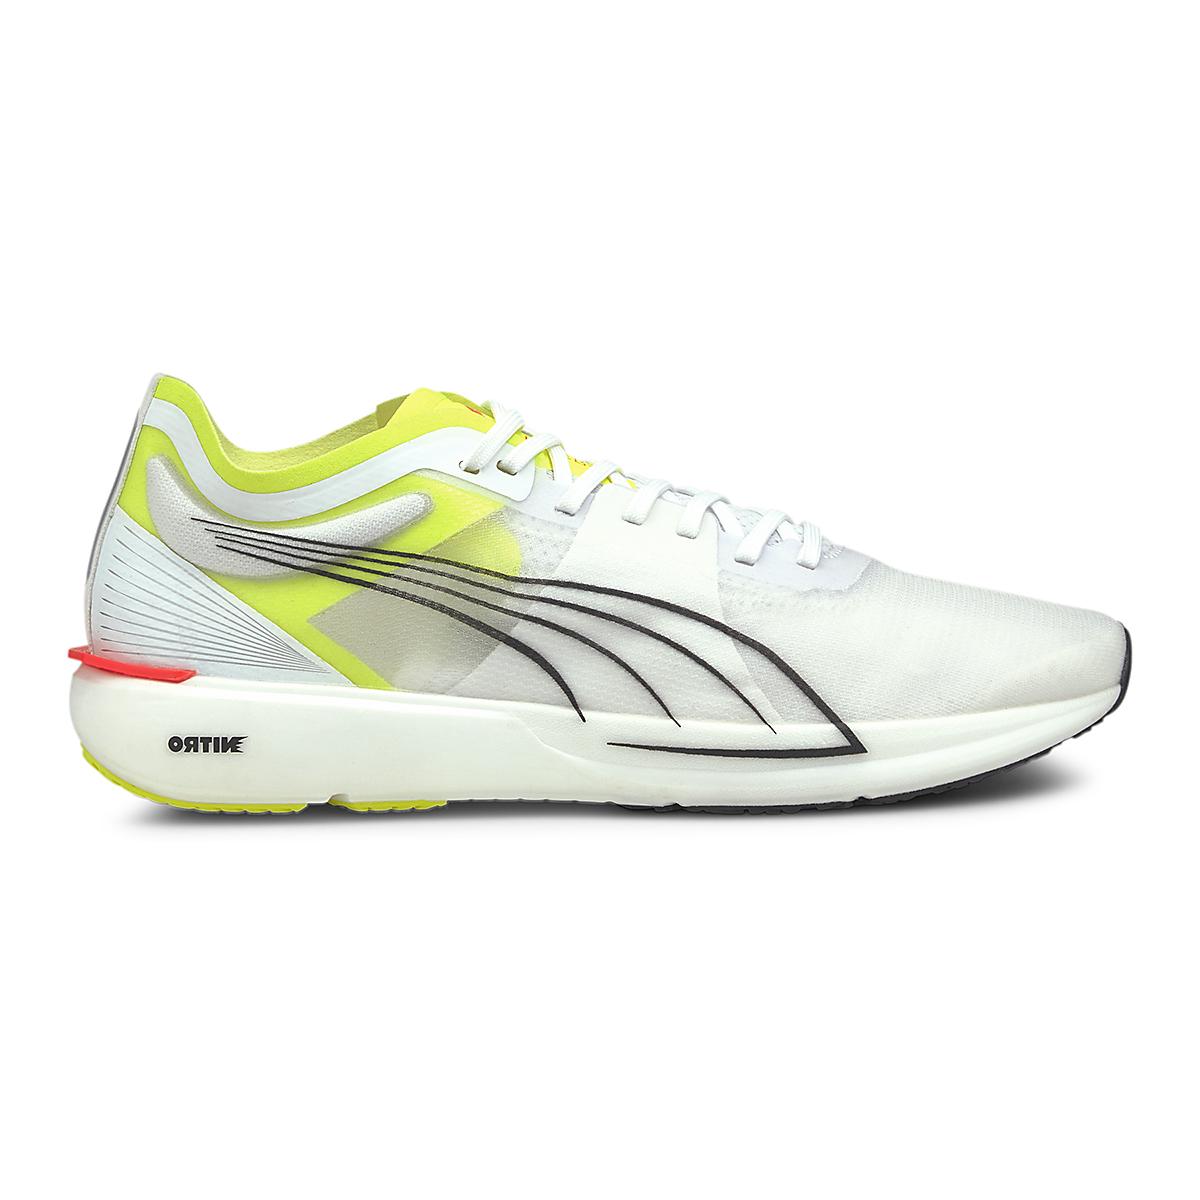 Men's Puma Liberate Nitro Running Shoe - Color: Puma White-Yellow Alert - Size: 7 - Width: Regular, Puma White-Yellow Alert, large, image 1